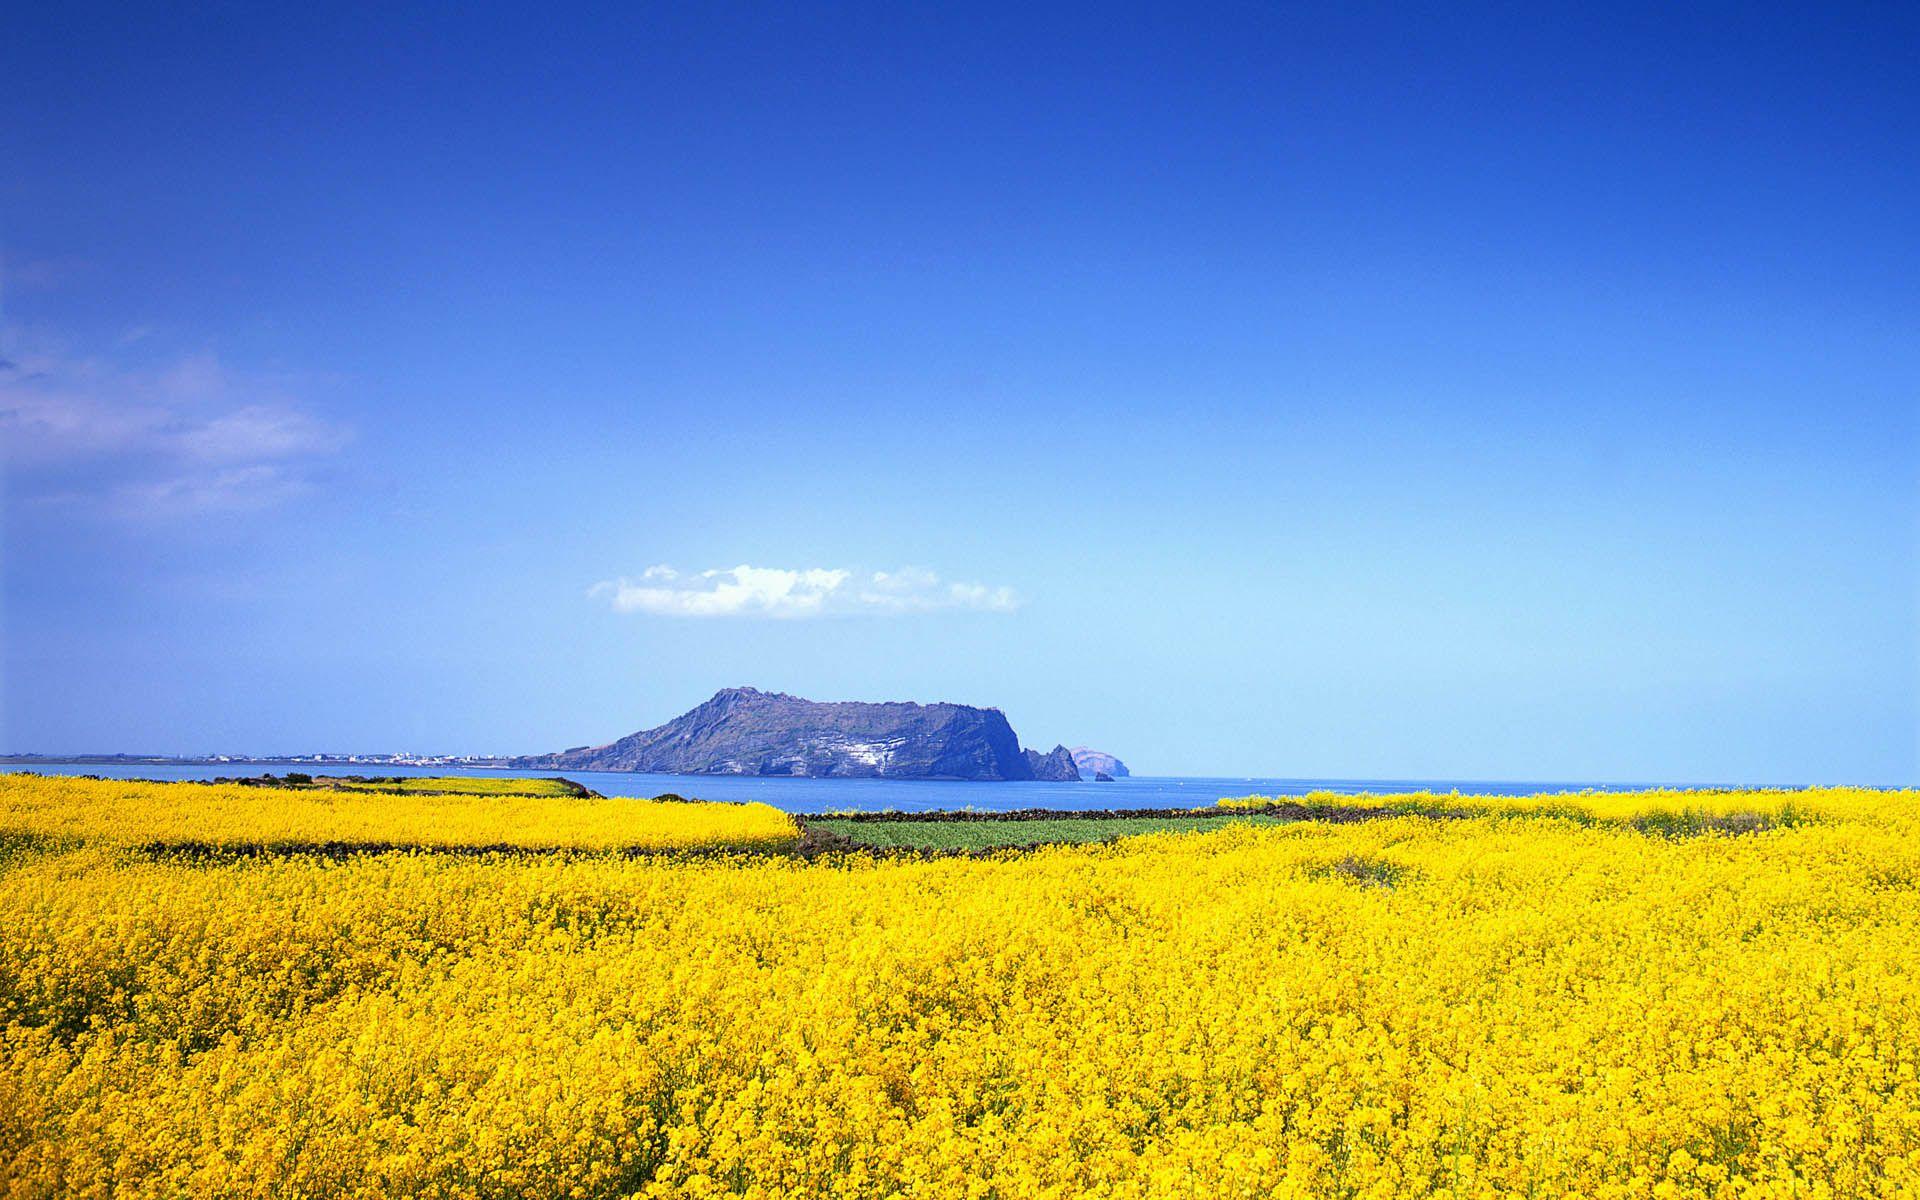 Jeju Island I D Love To Visit Korea One Day Jeju Island Nature Wallpaper South Korea Travel